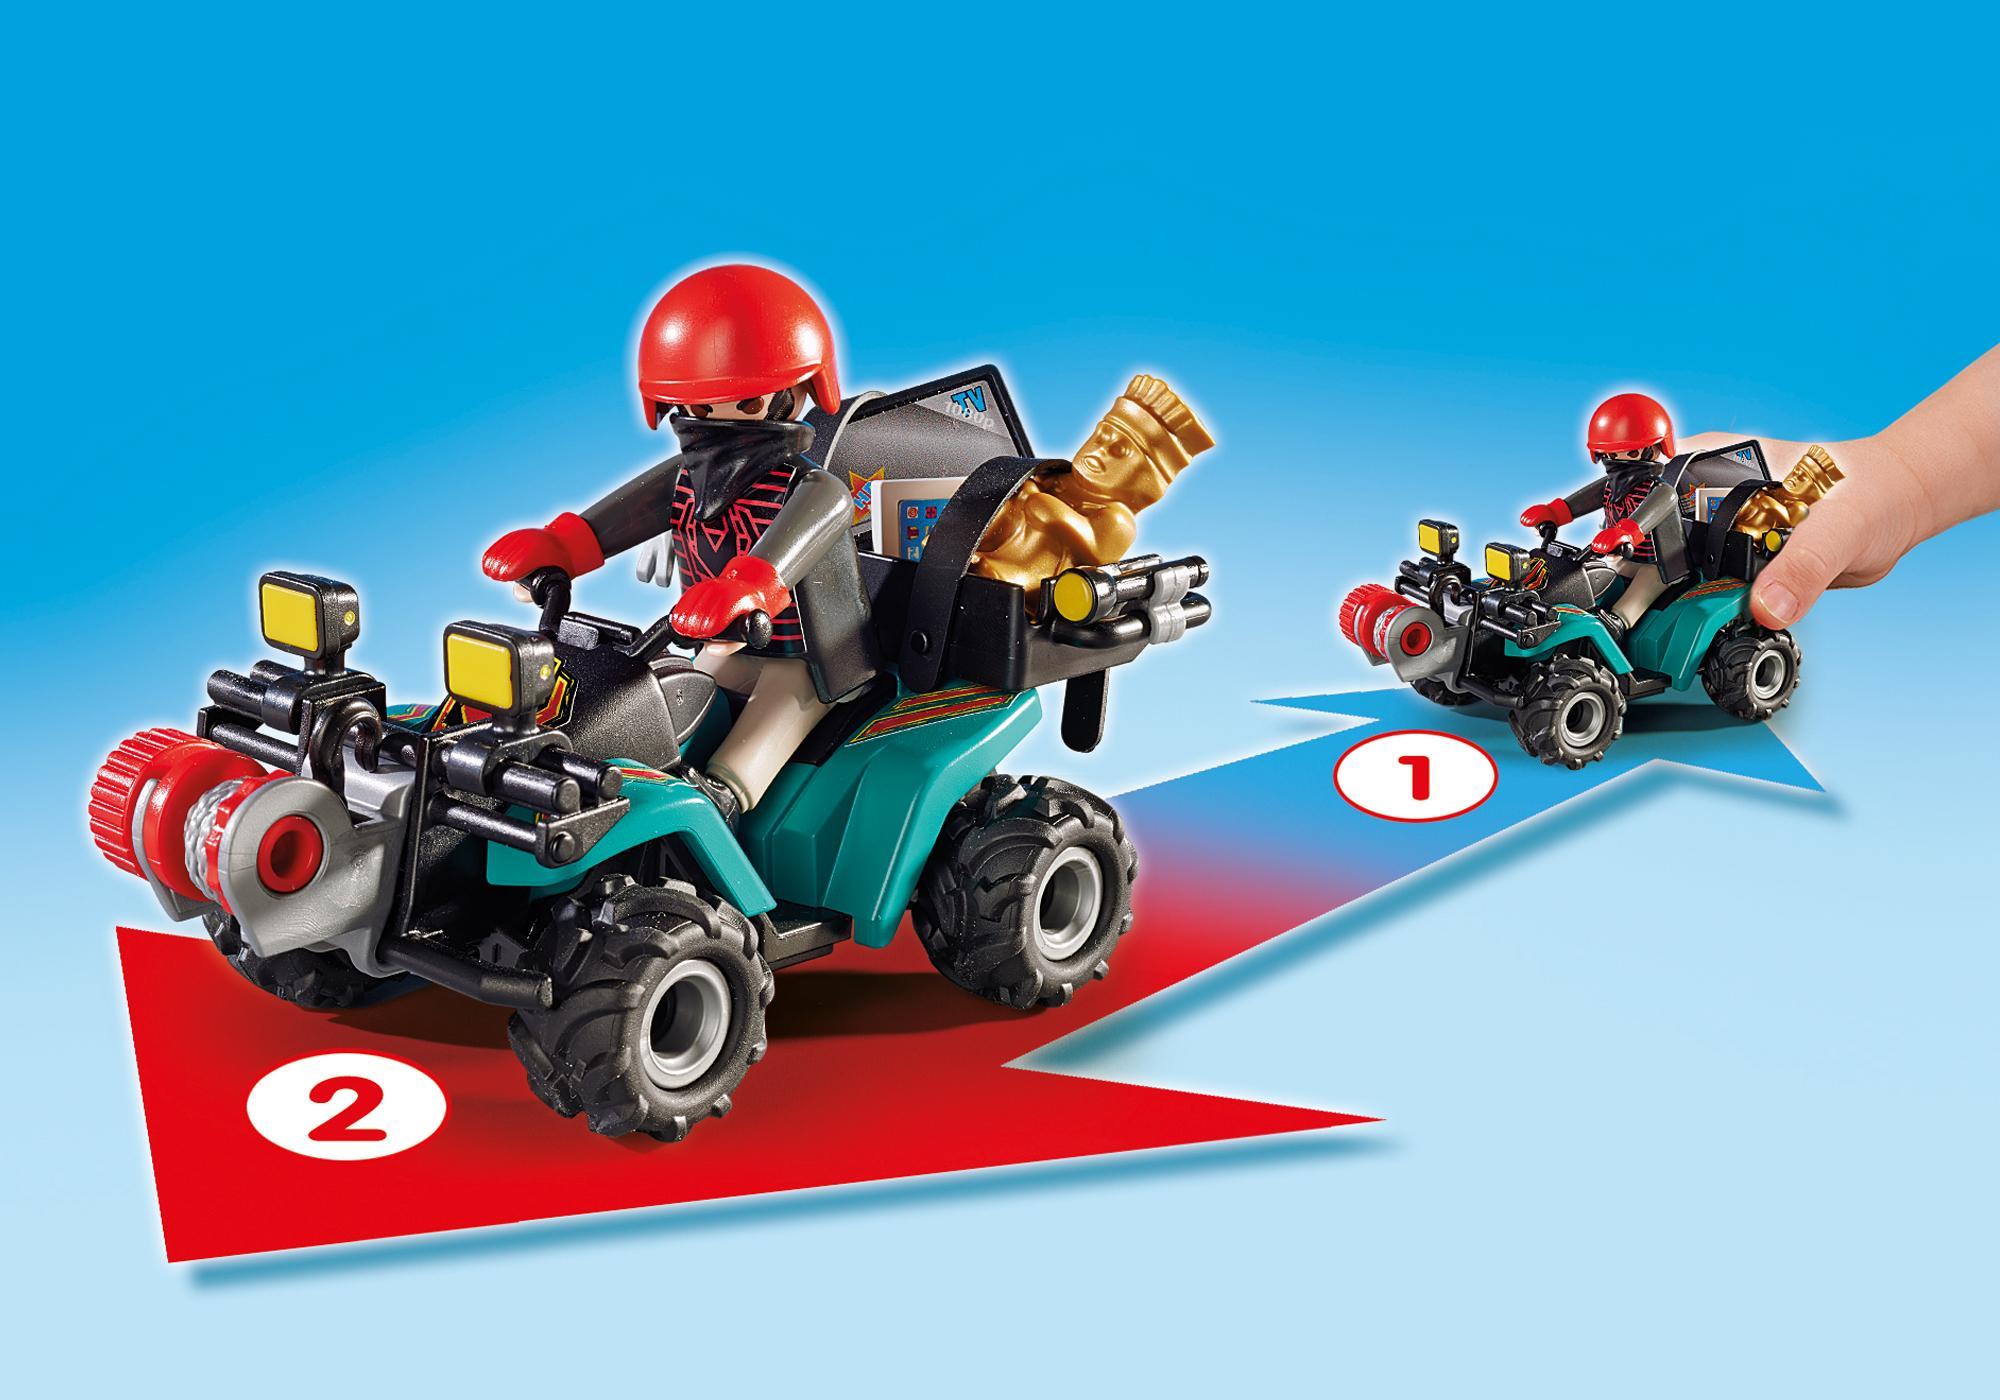 http://media.playmobil.com/i/playmobil/6879_product_extra1/Quad avec treuil et bandit